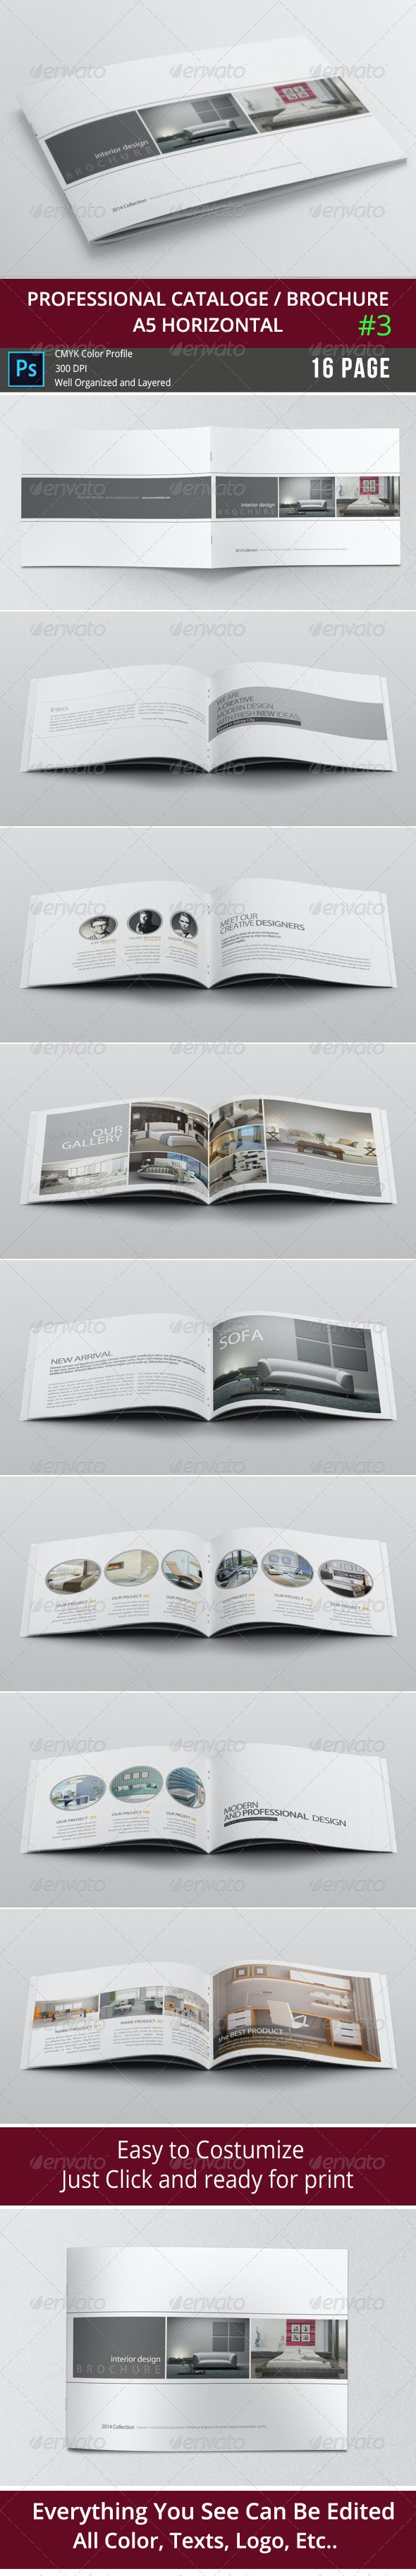 Simple & Clean A5 Catalogue 3 - Catalogs Brochures